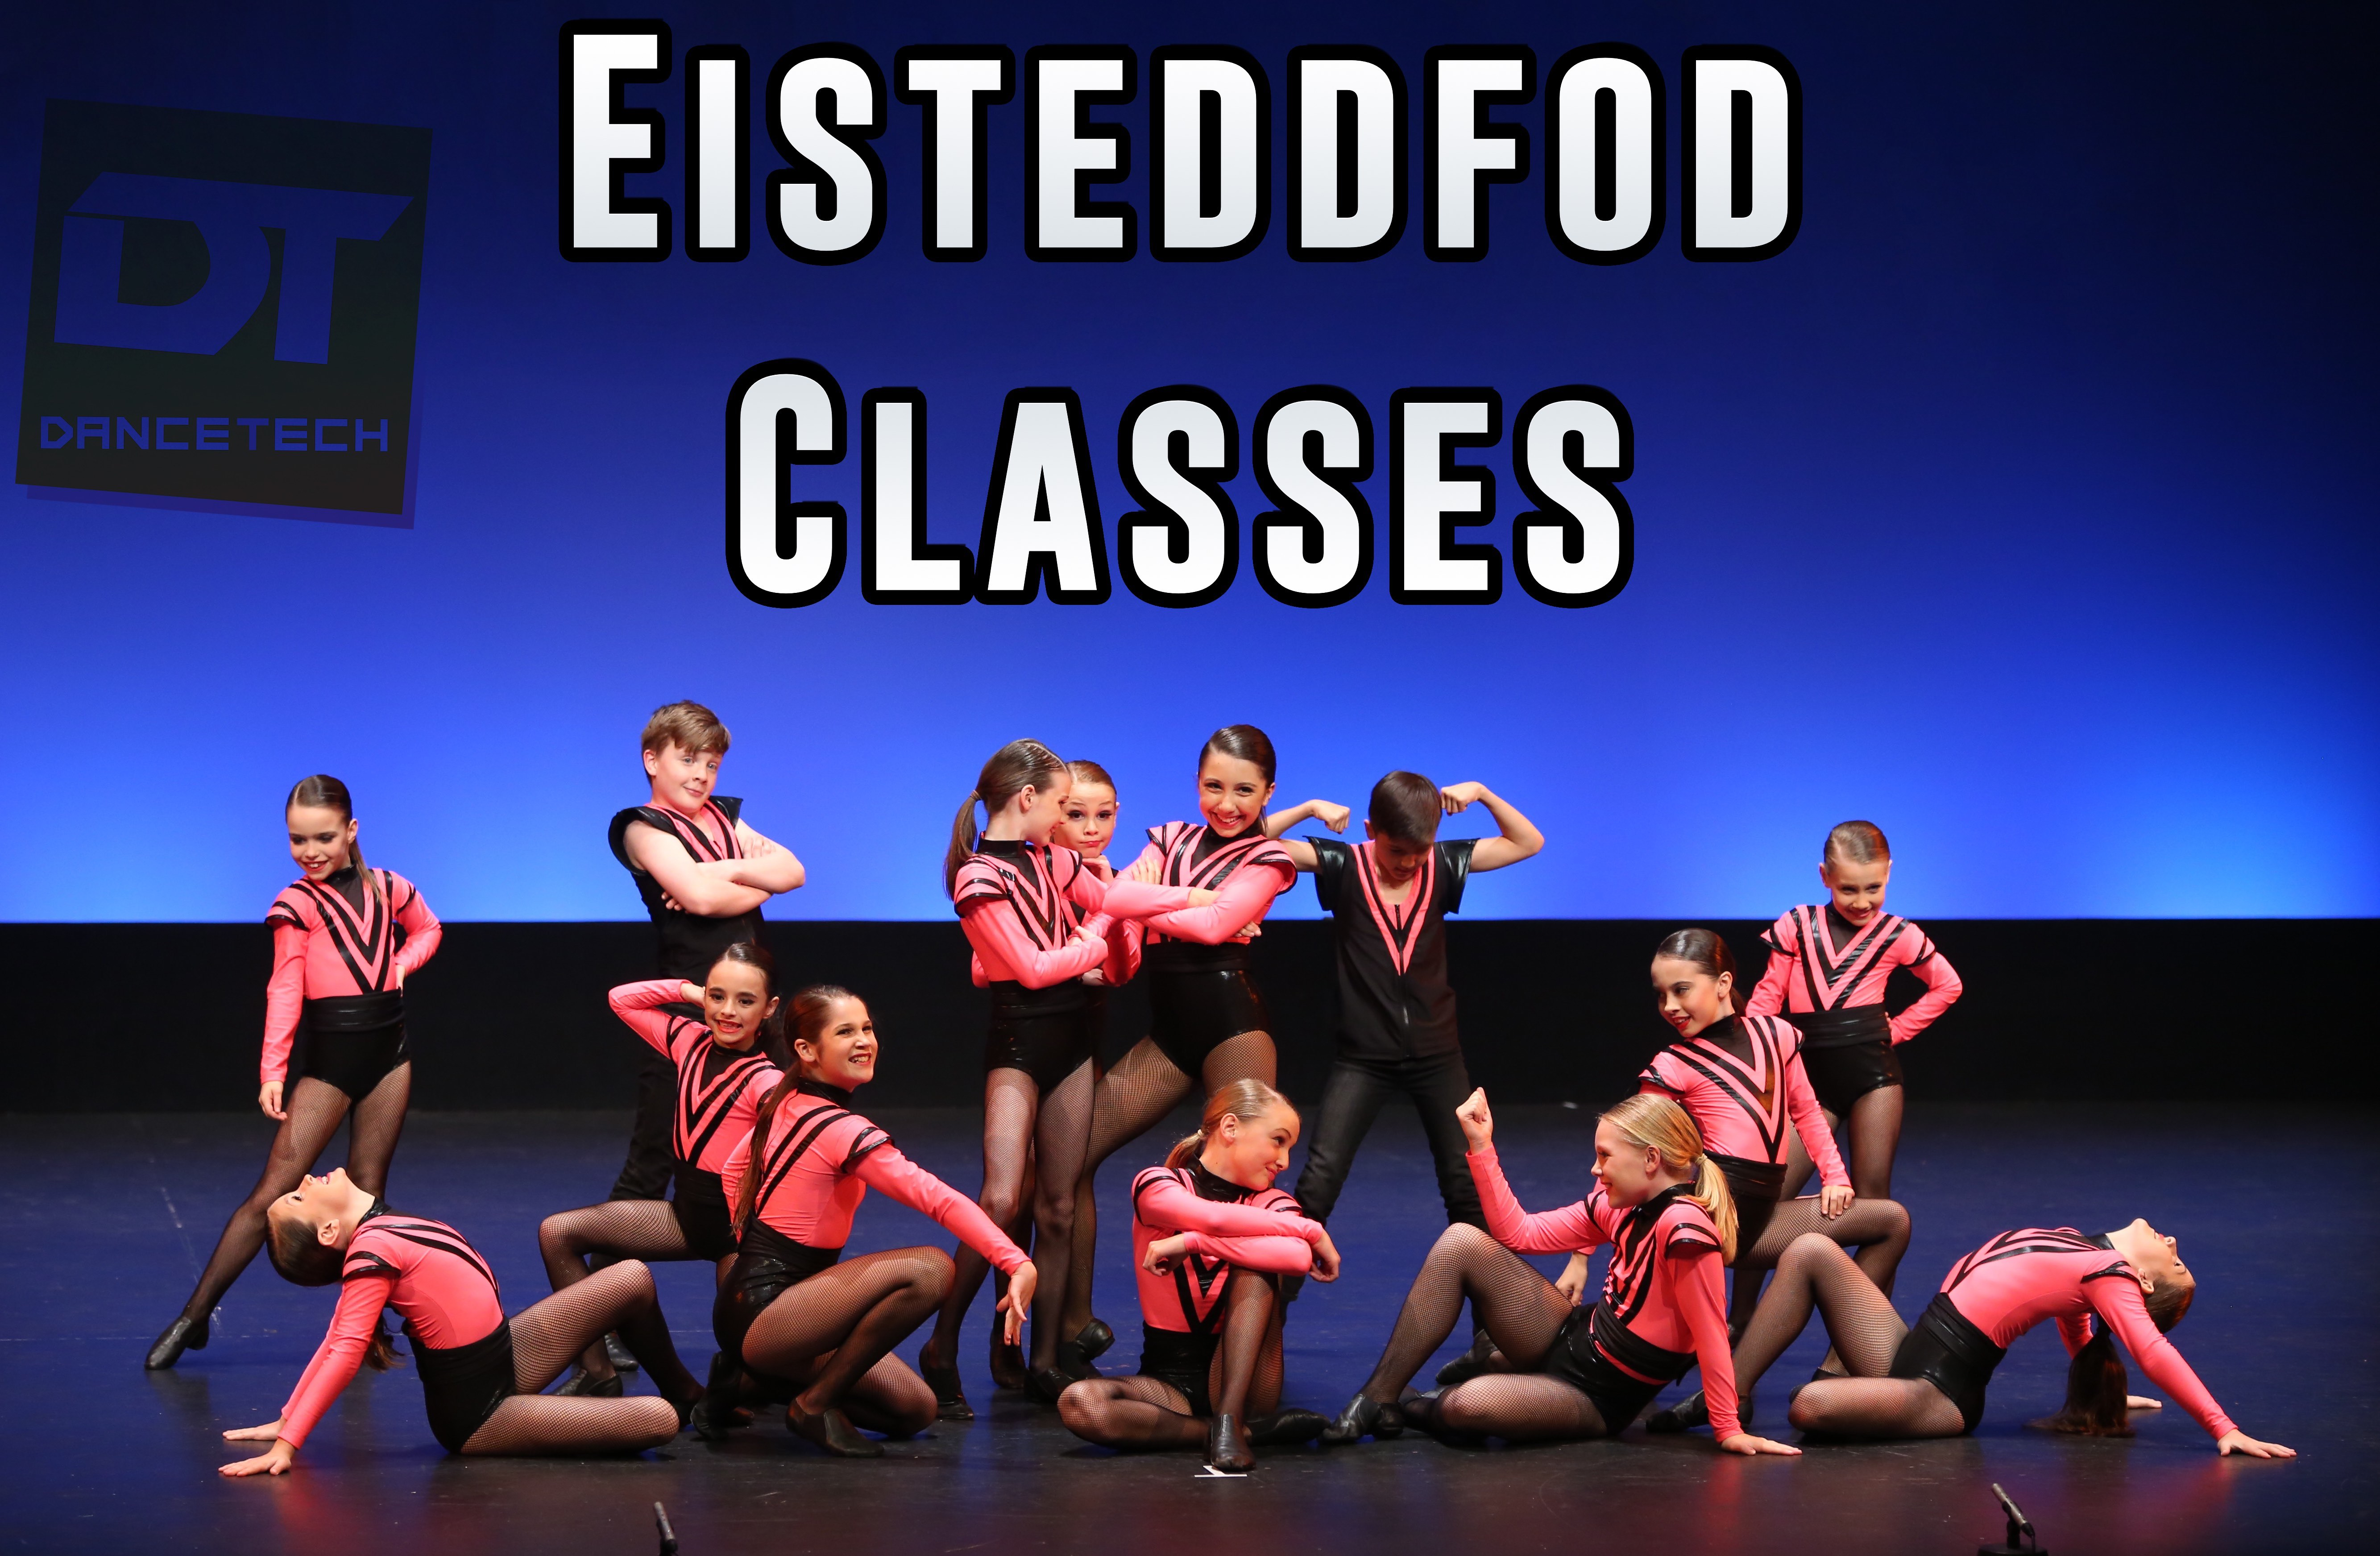 eisteddfod-classes-website-banner